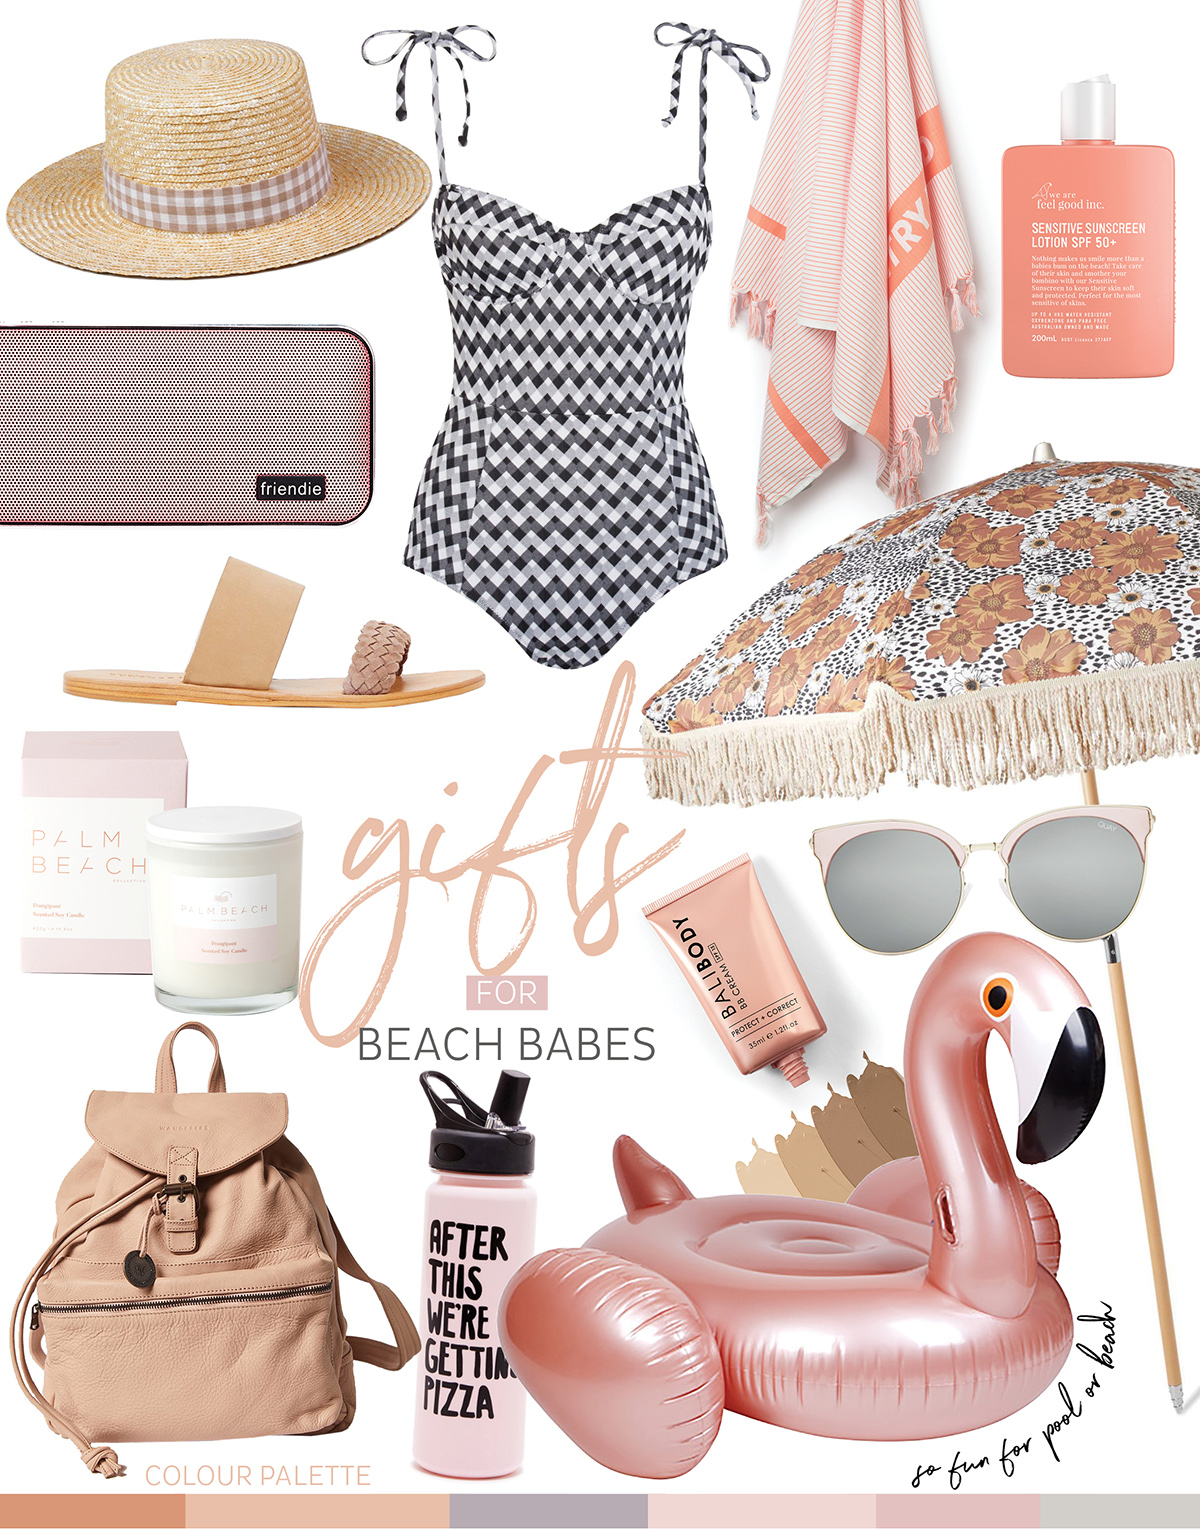 adore_home_magazine_christmas-gift-guide_beachbabe.jpg